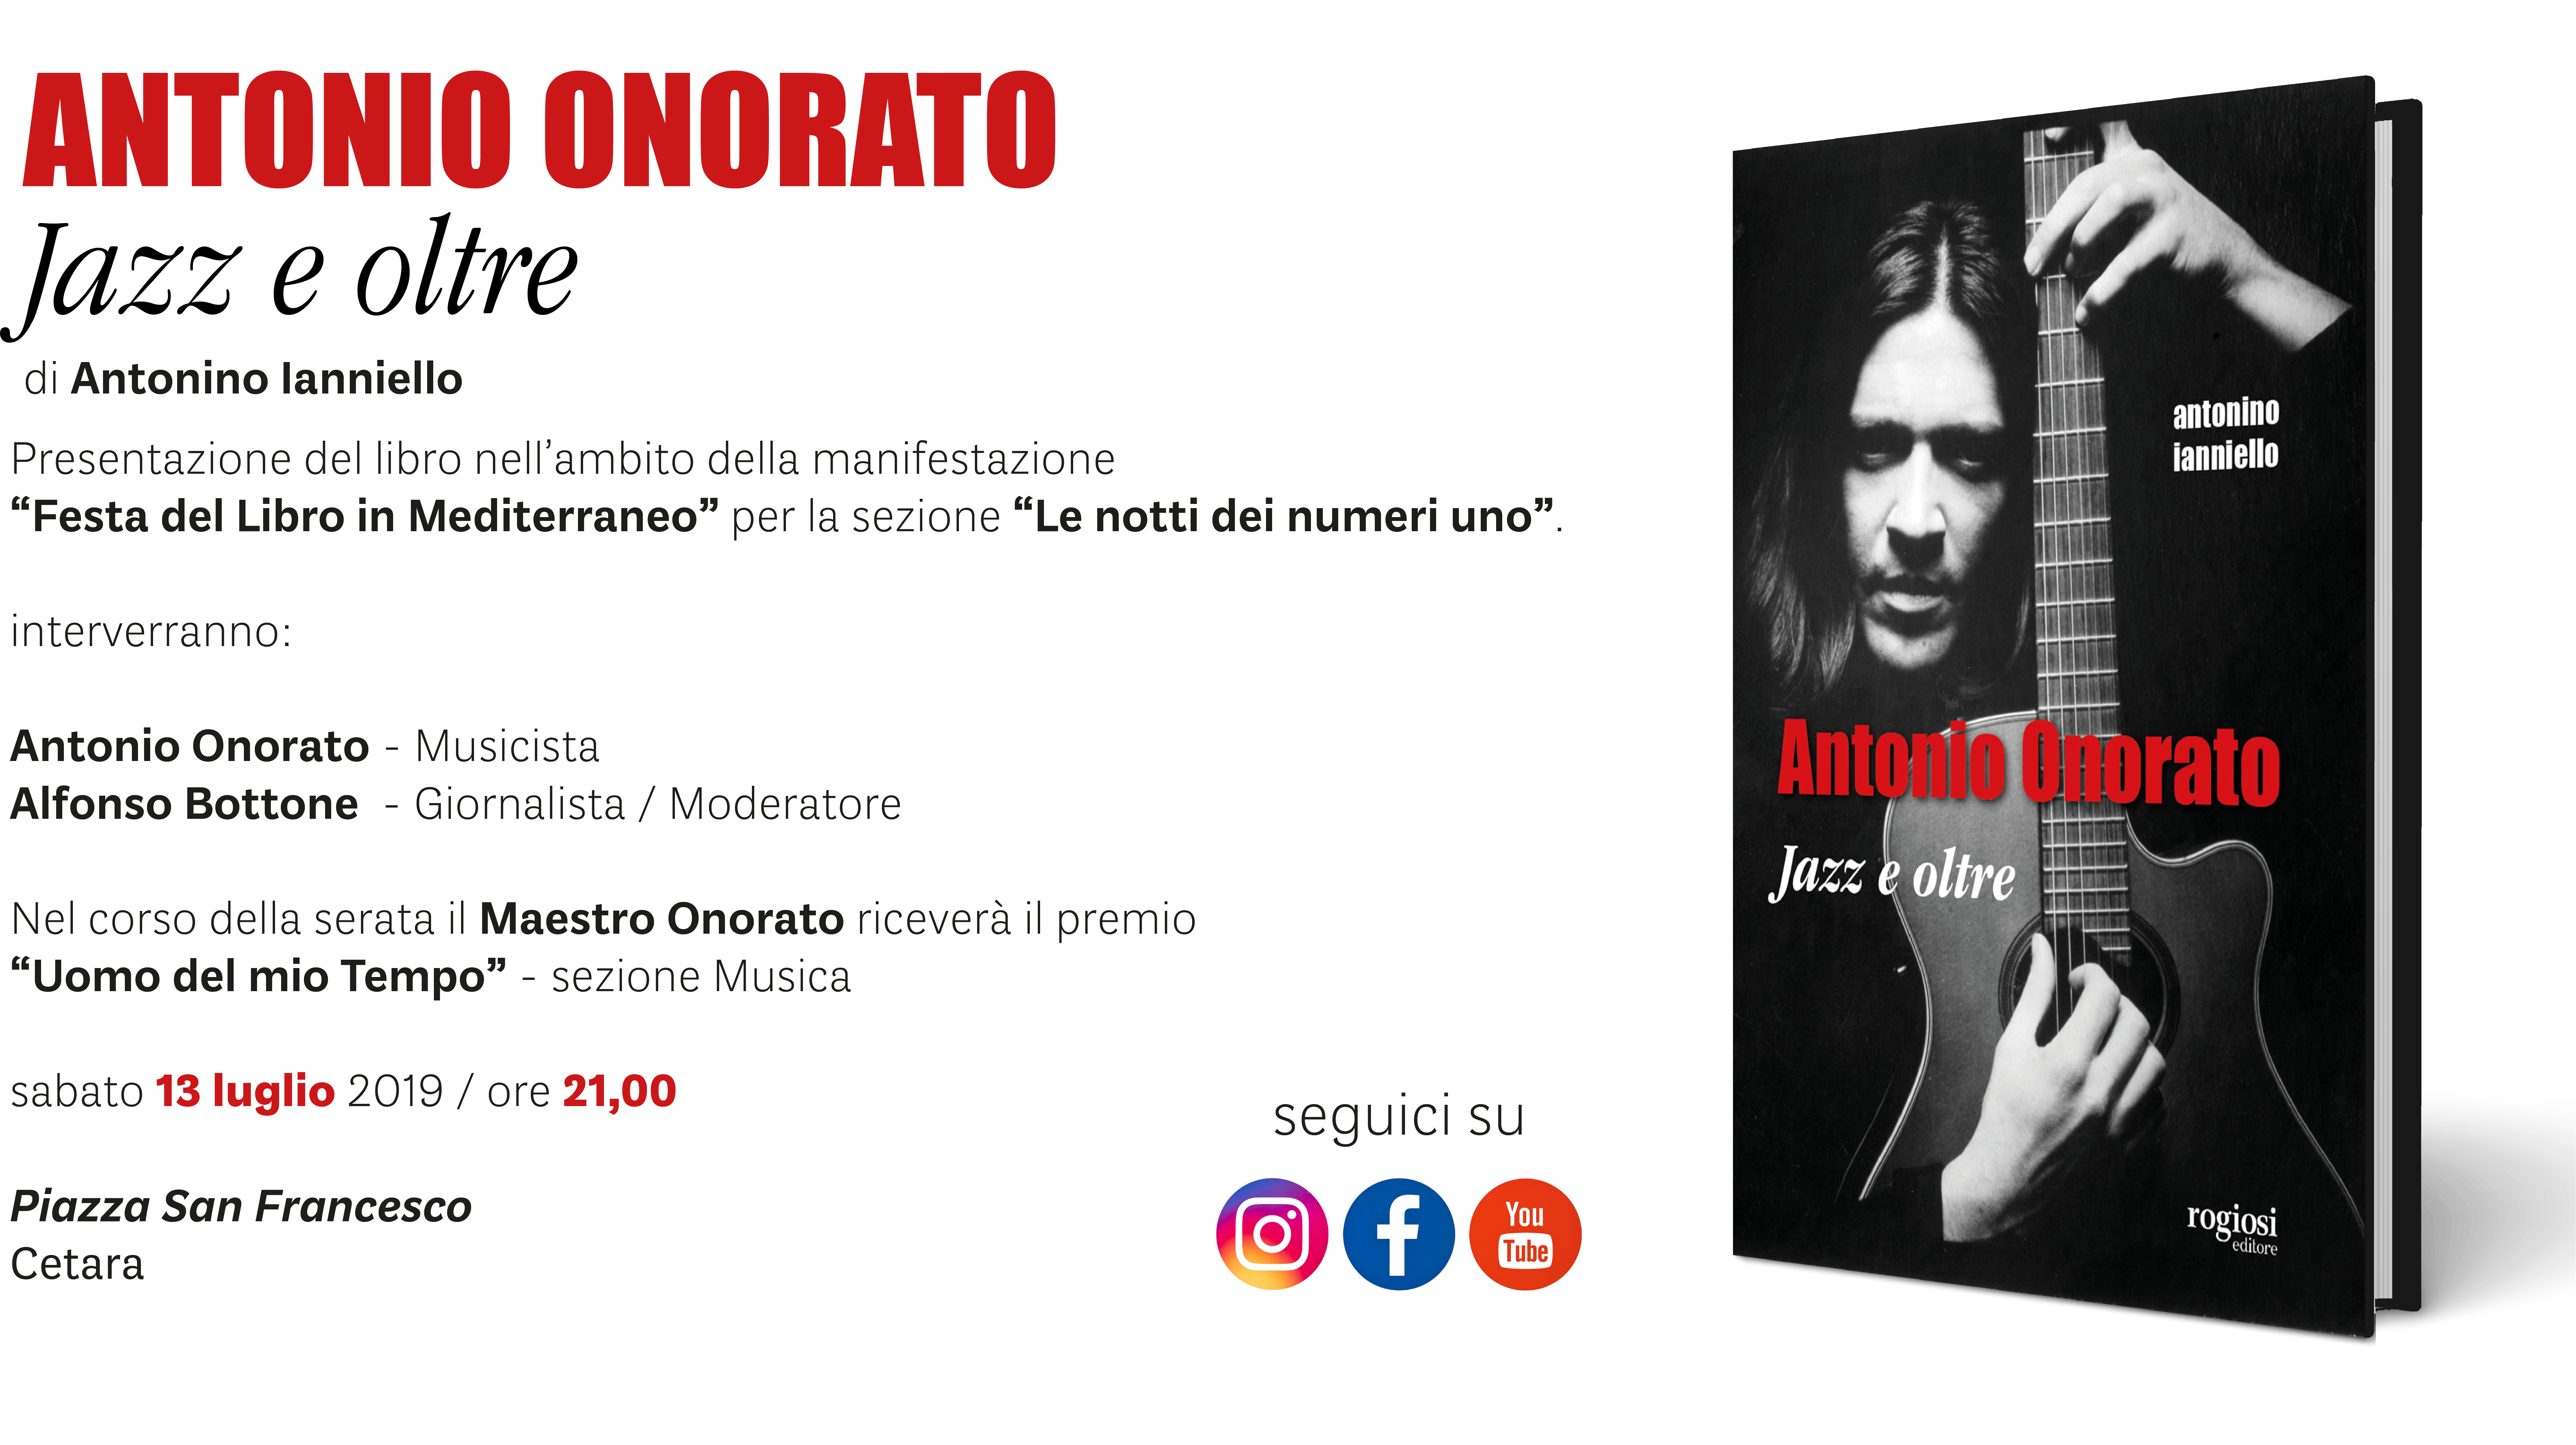 """Antonio Onorato. Jazz e oltre"" a Cetara"